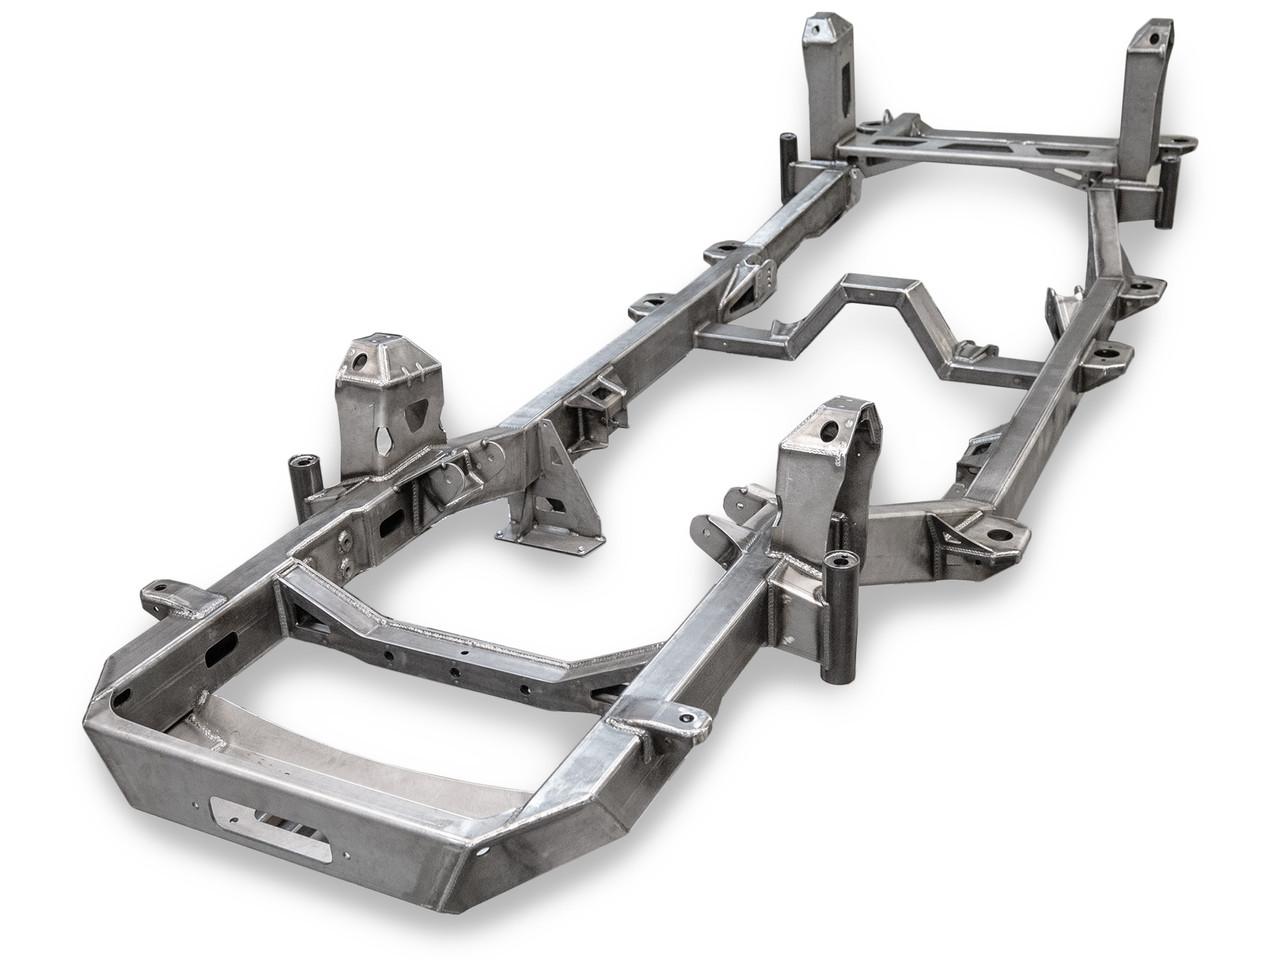 JK Elite Suspension System (Chassis Only)